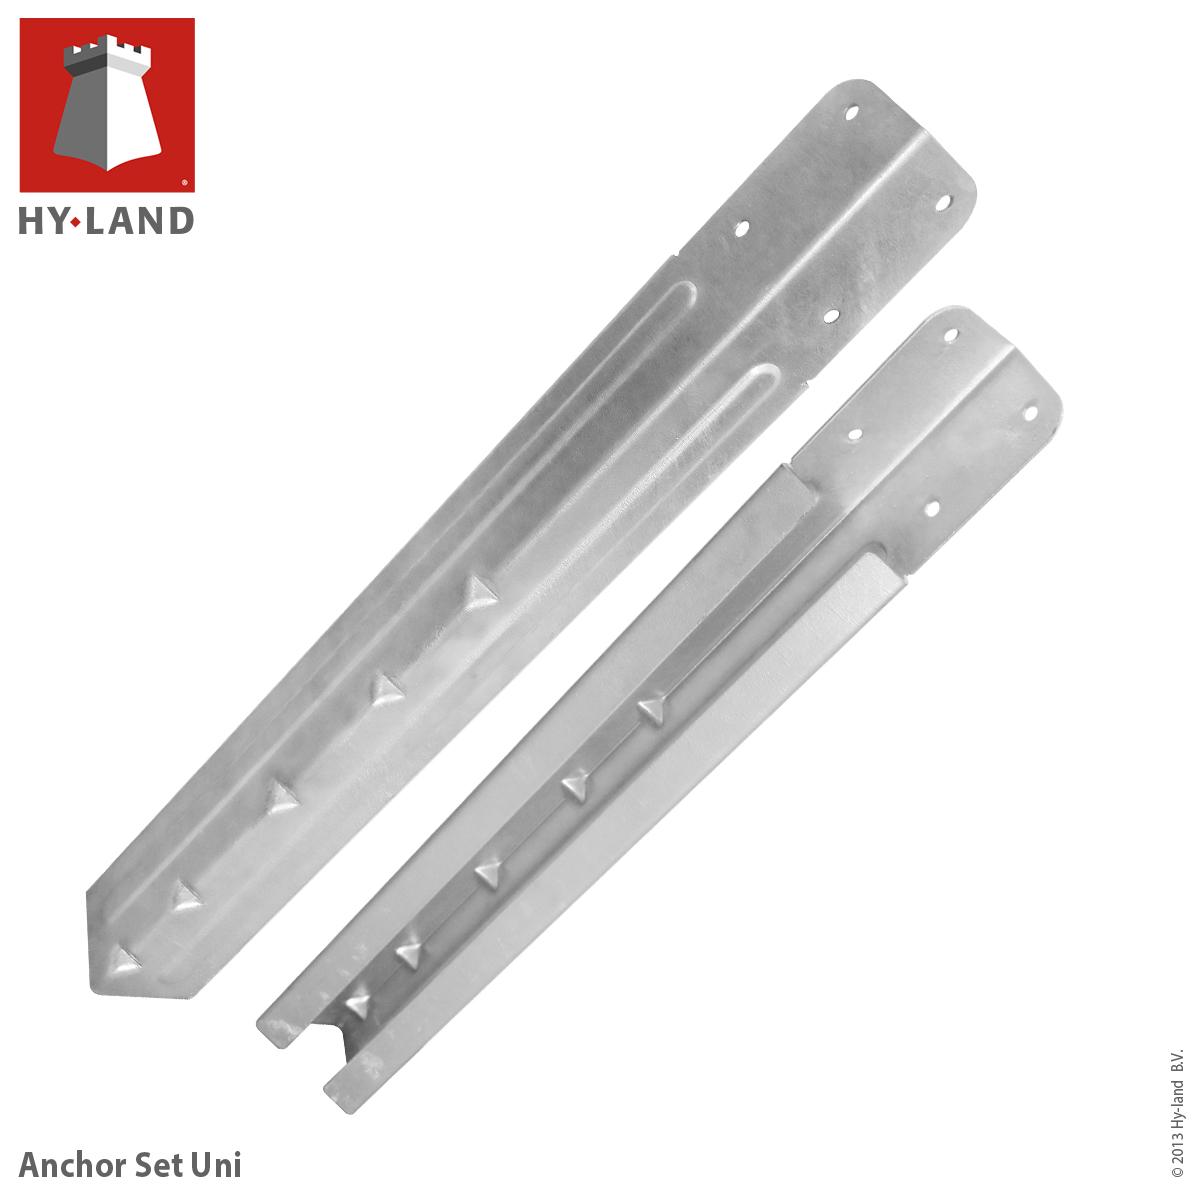 Hy-Land | Anchor Set